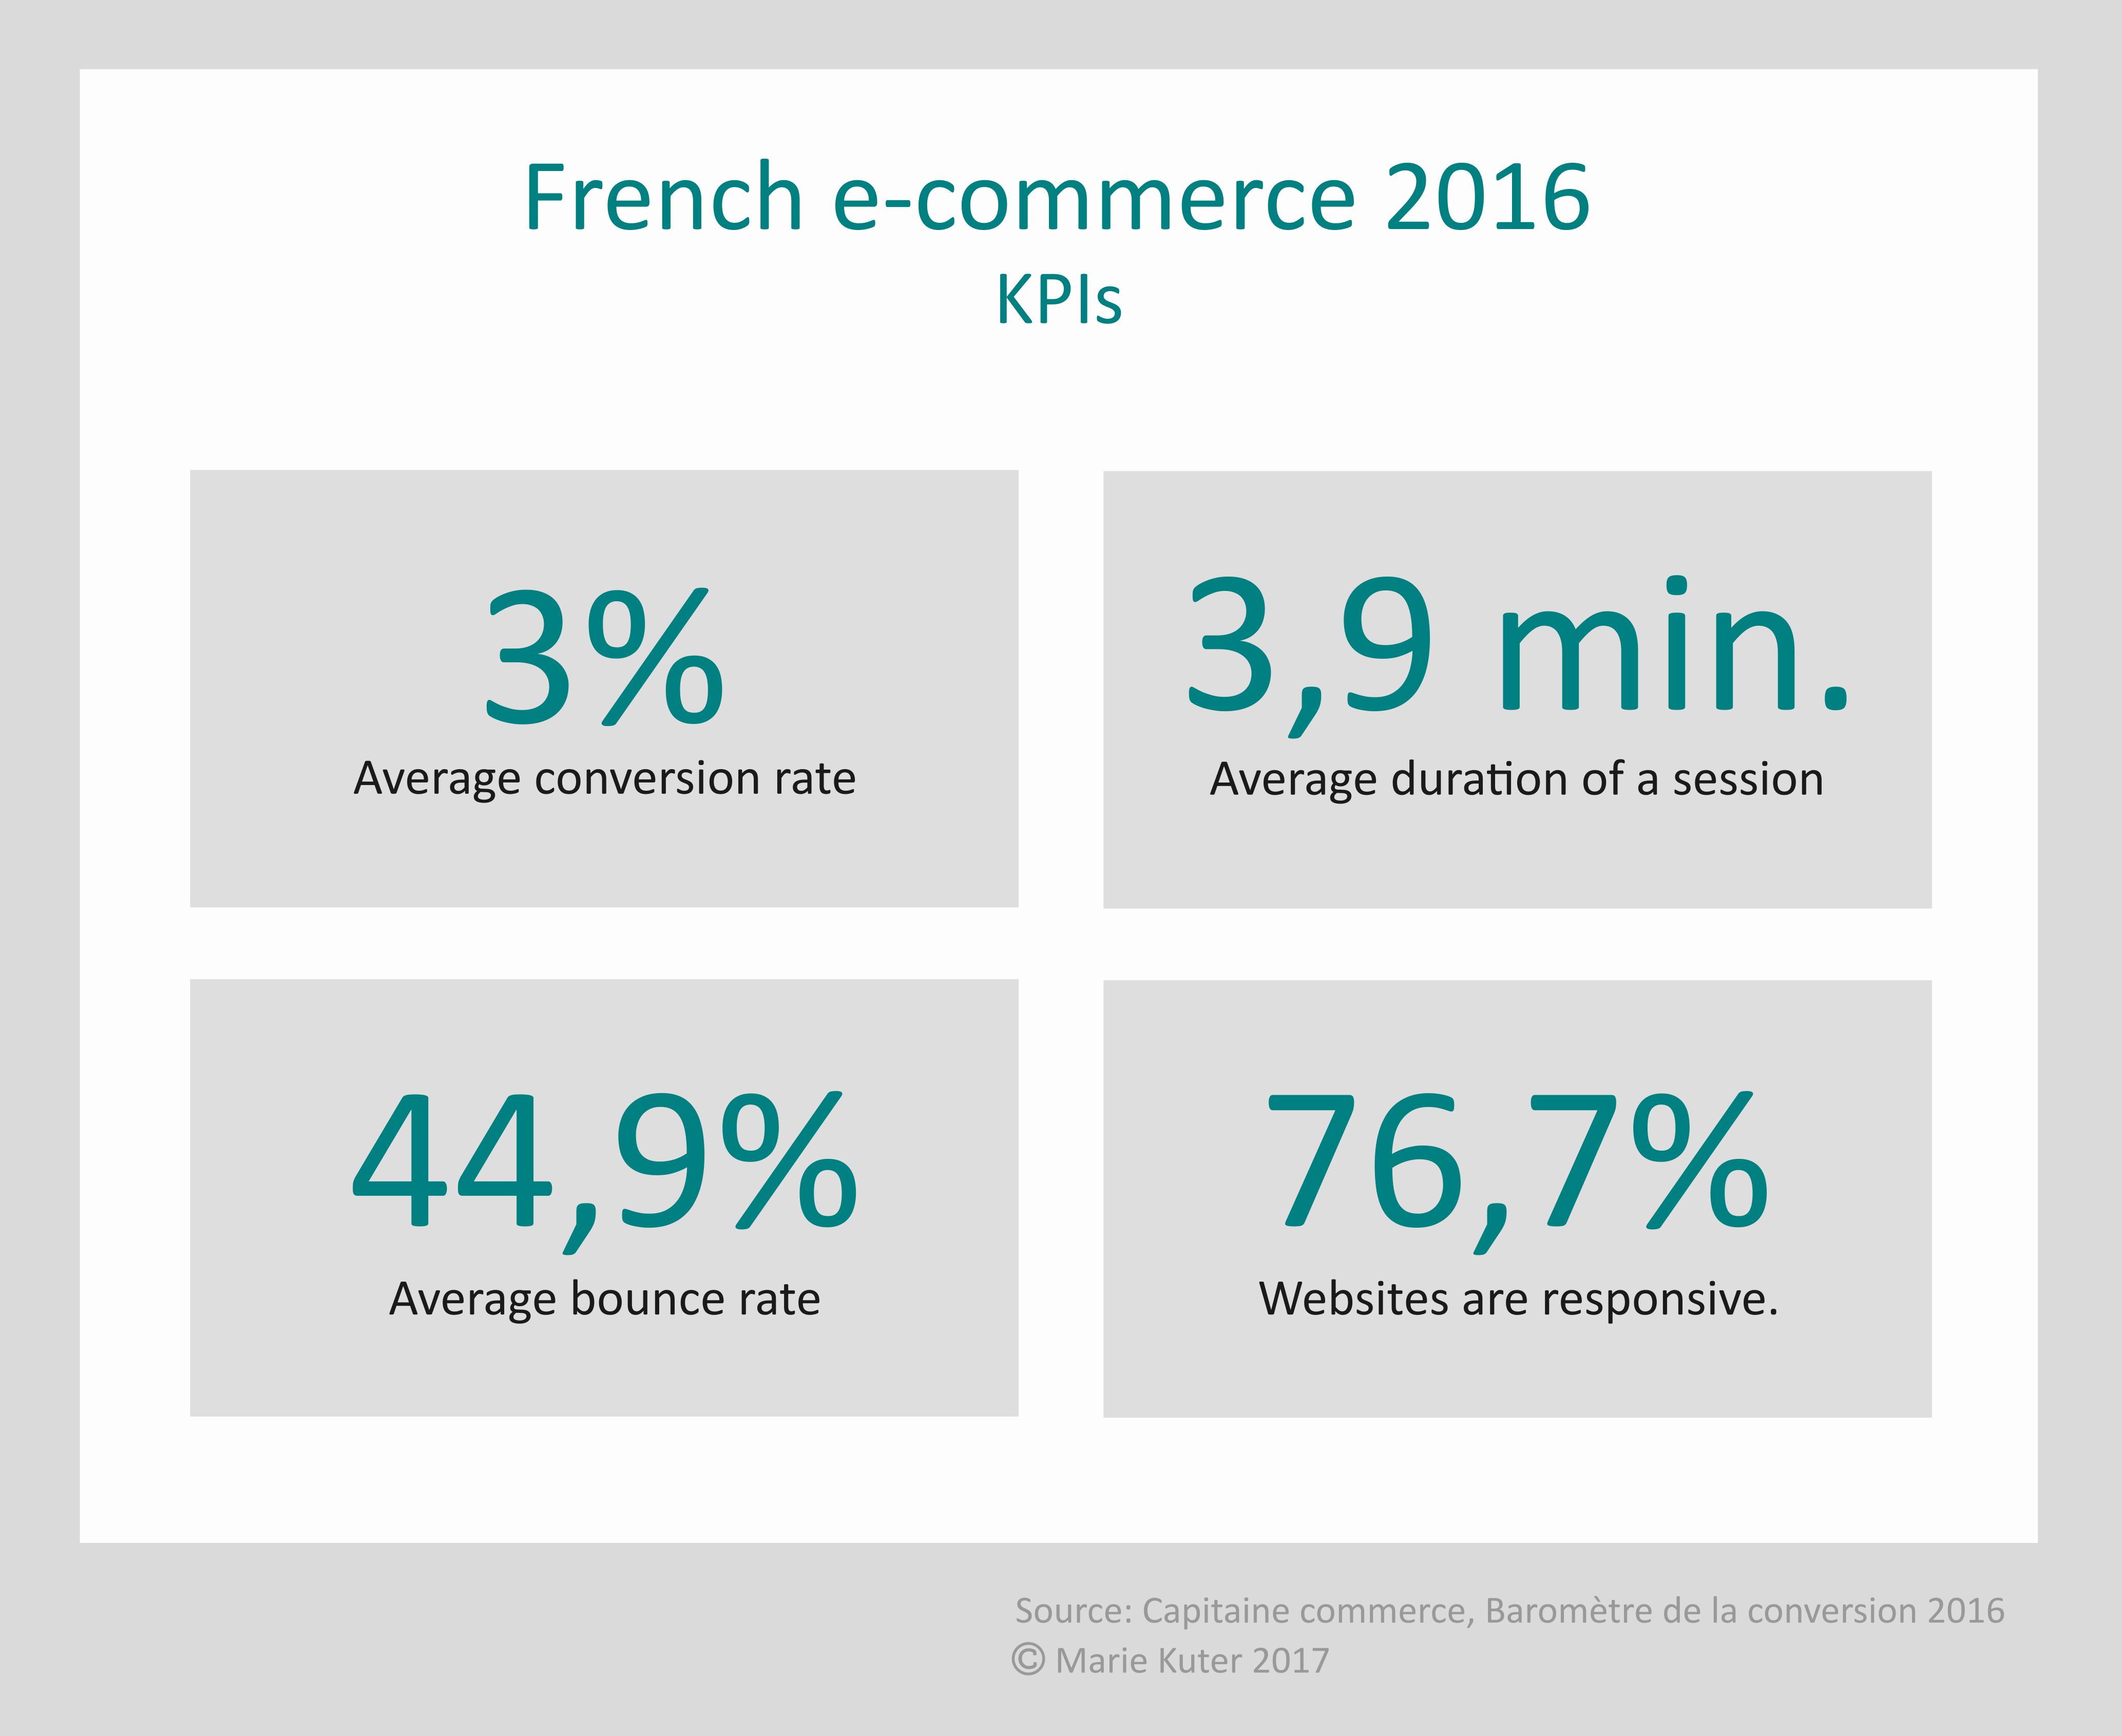 French e-commerce 2016: KPIs